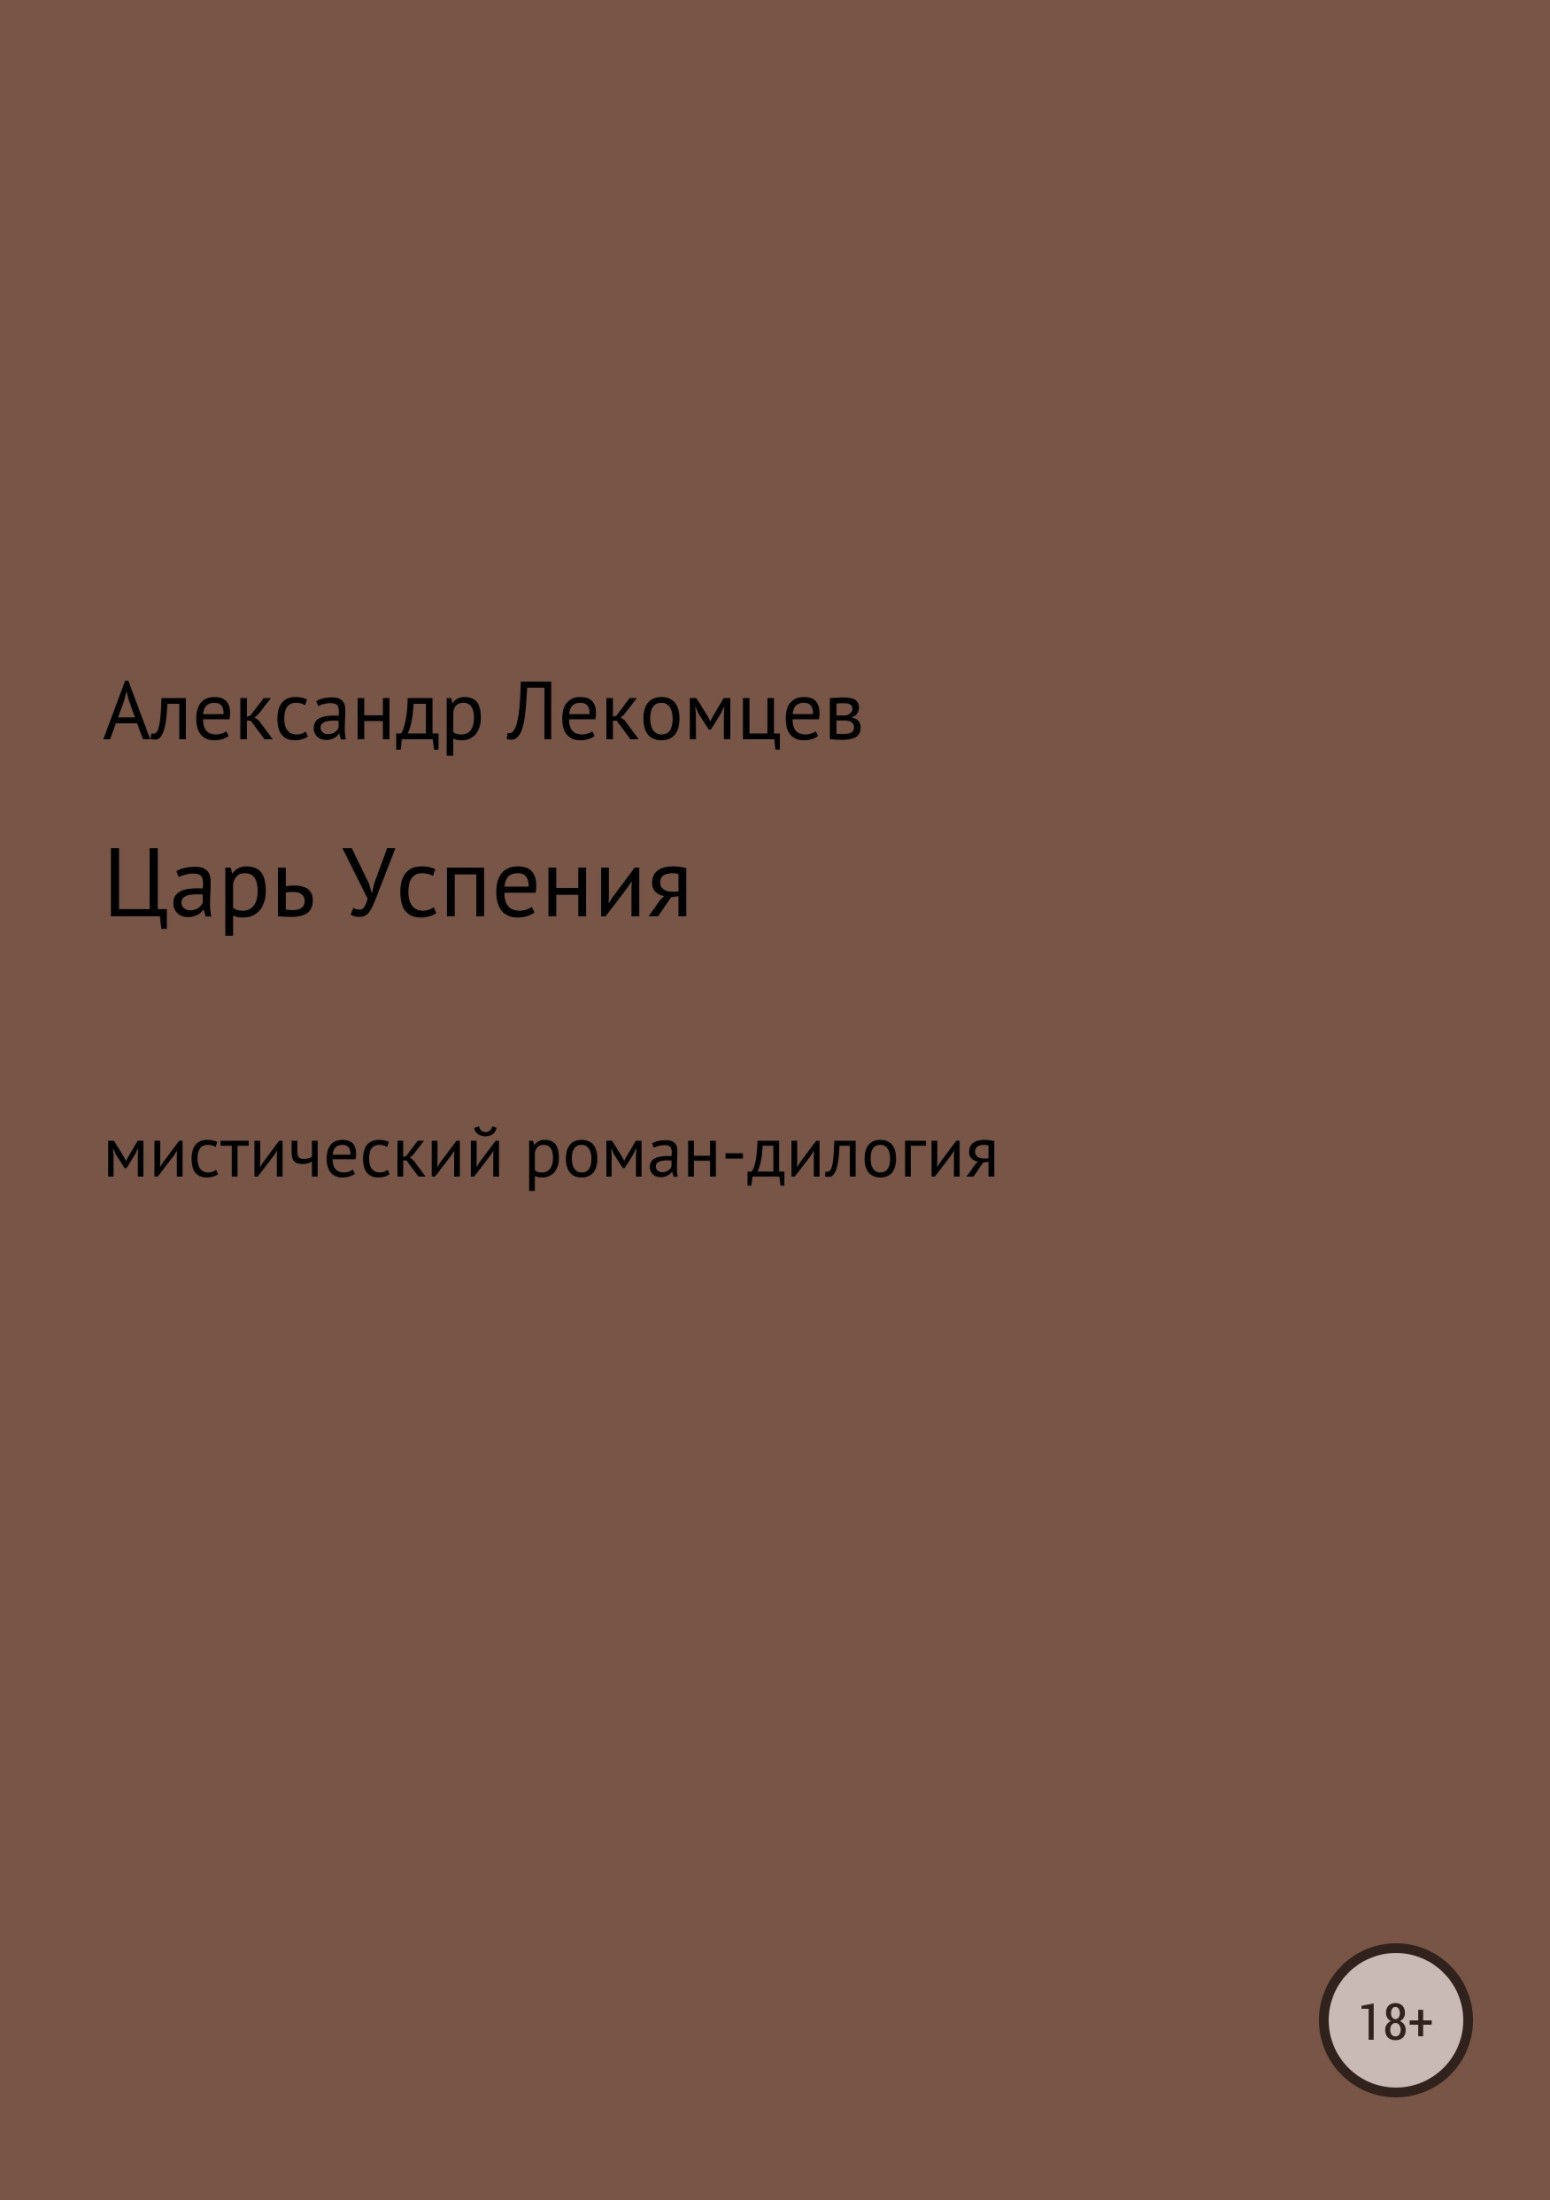 Александр Лекомцев - Царь Успения